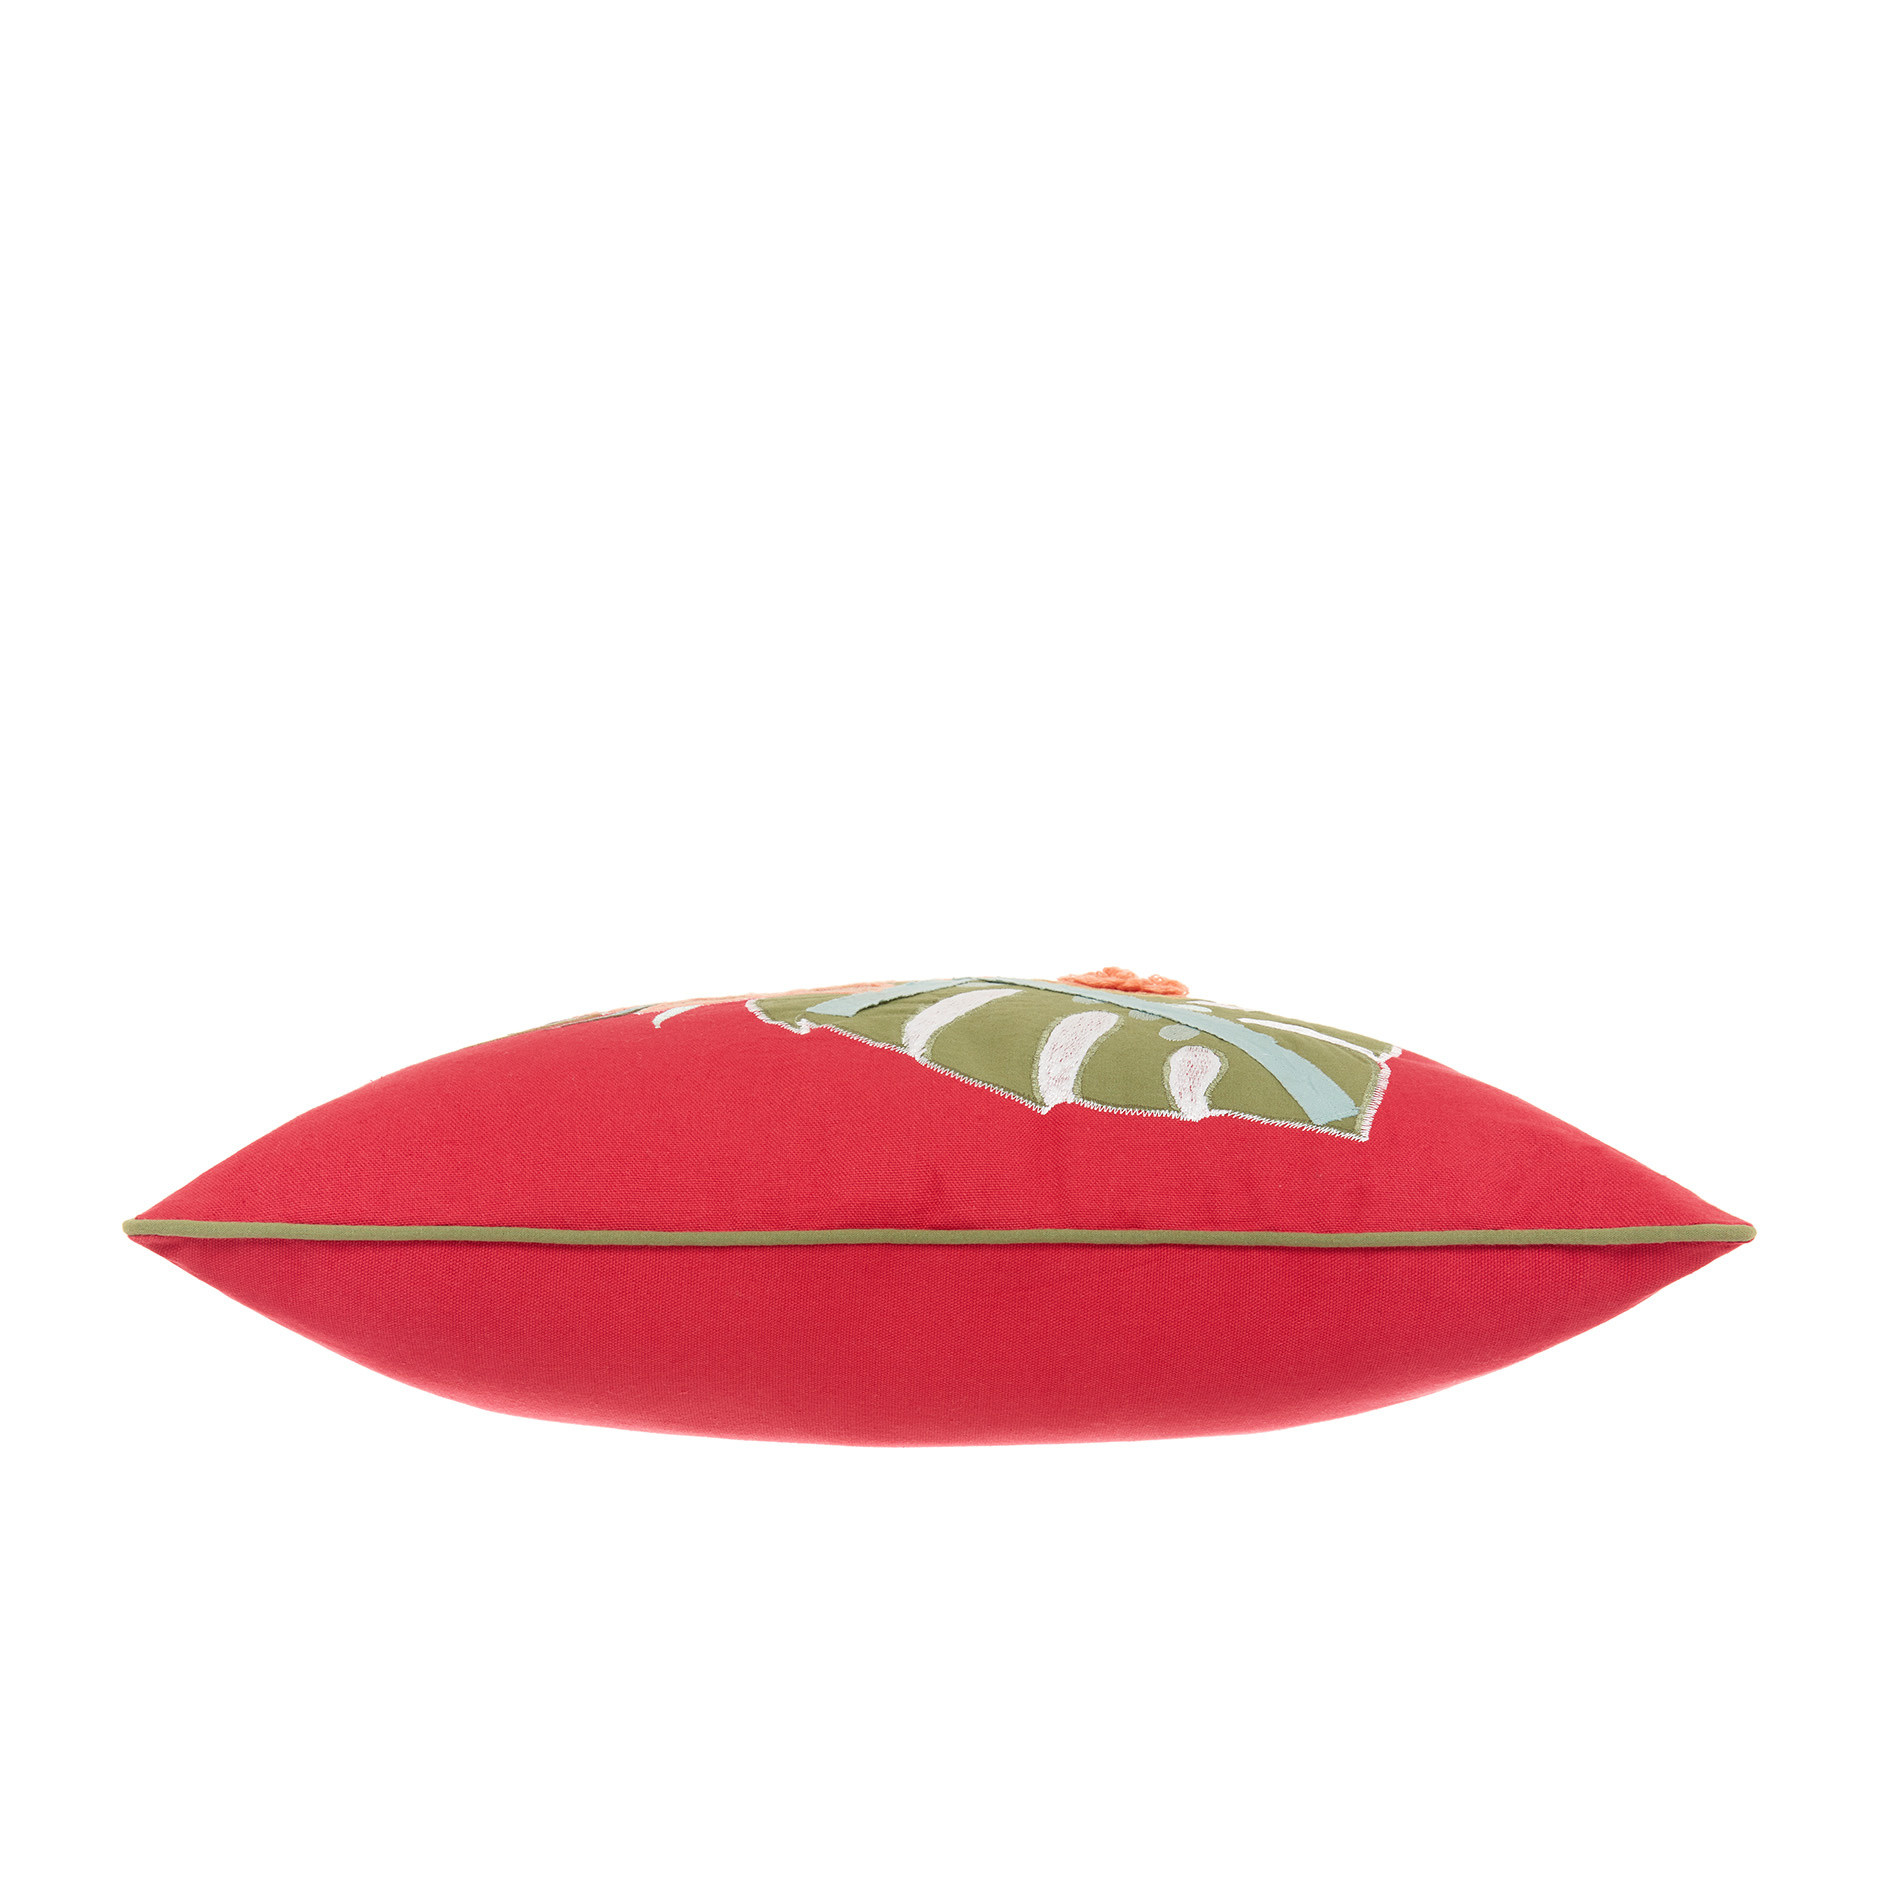 Cuscino ricamo foglie 45x45cm, Rosso, large image number 2